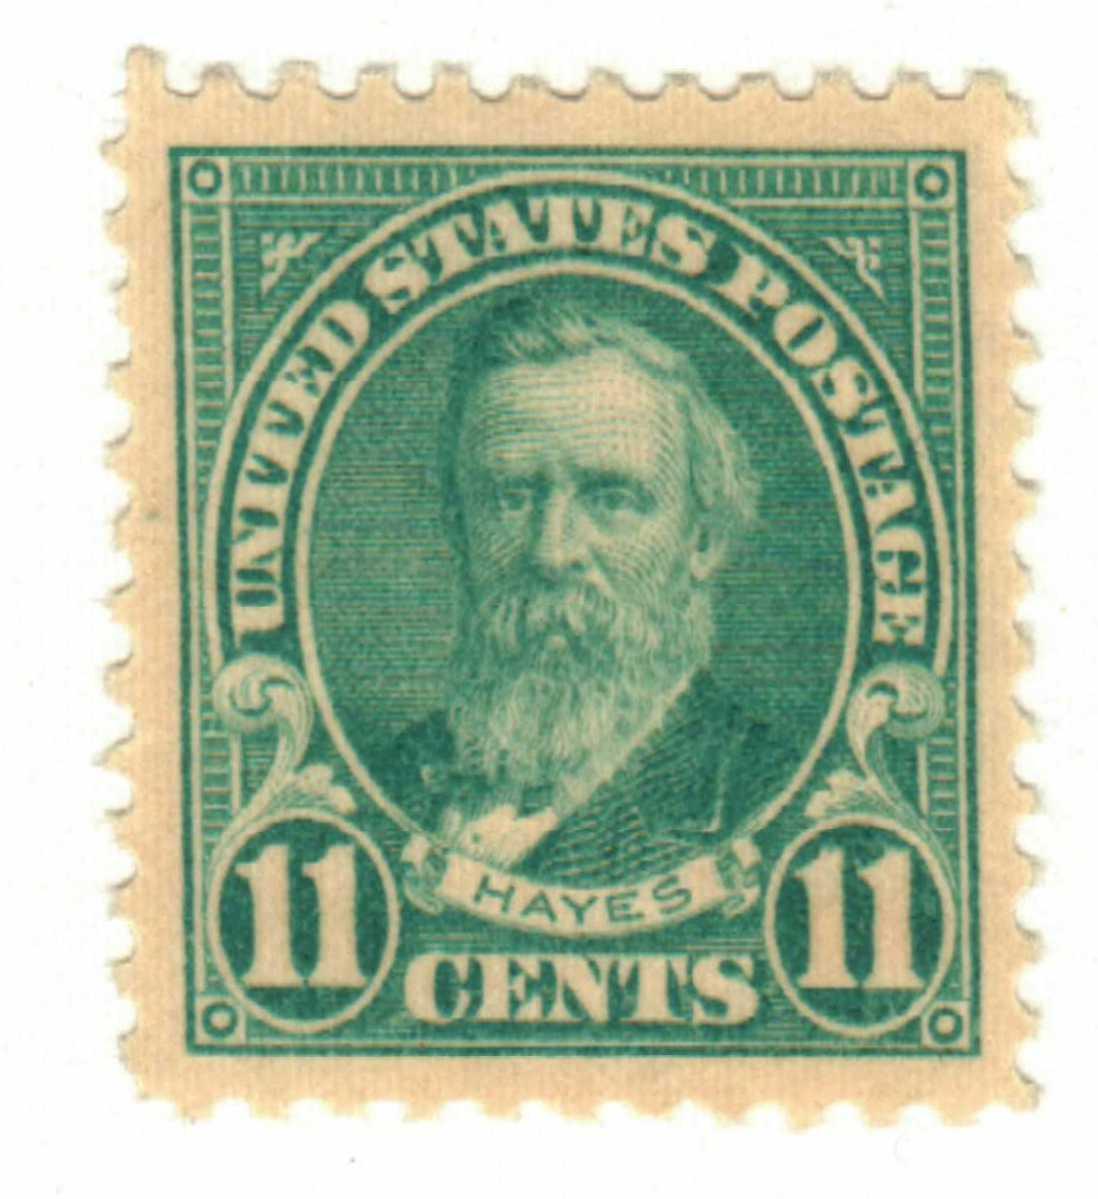 1922 11¢ Hayes, blue, perf 11